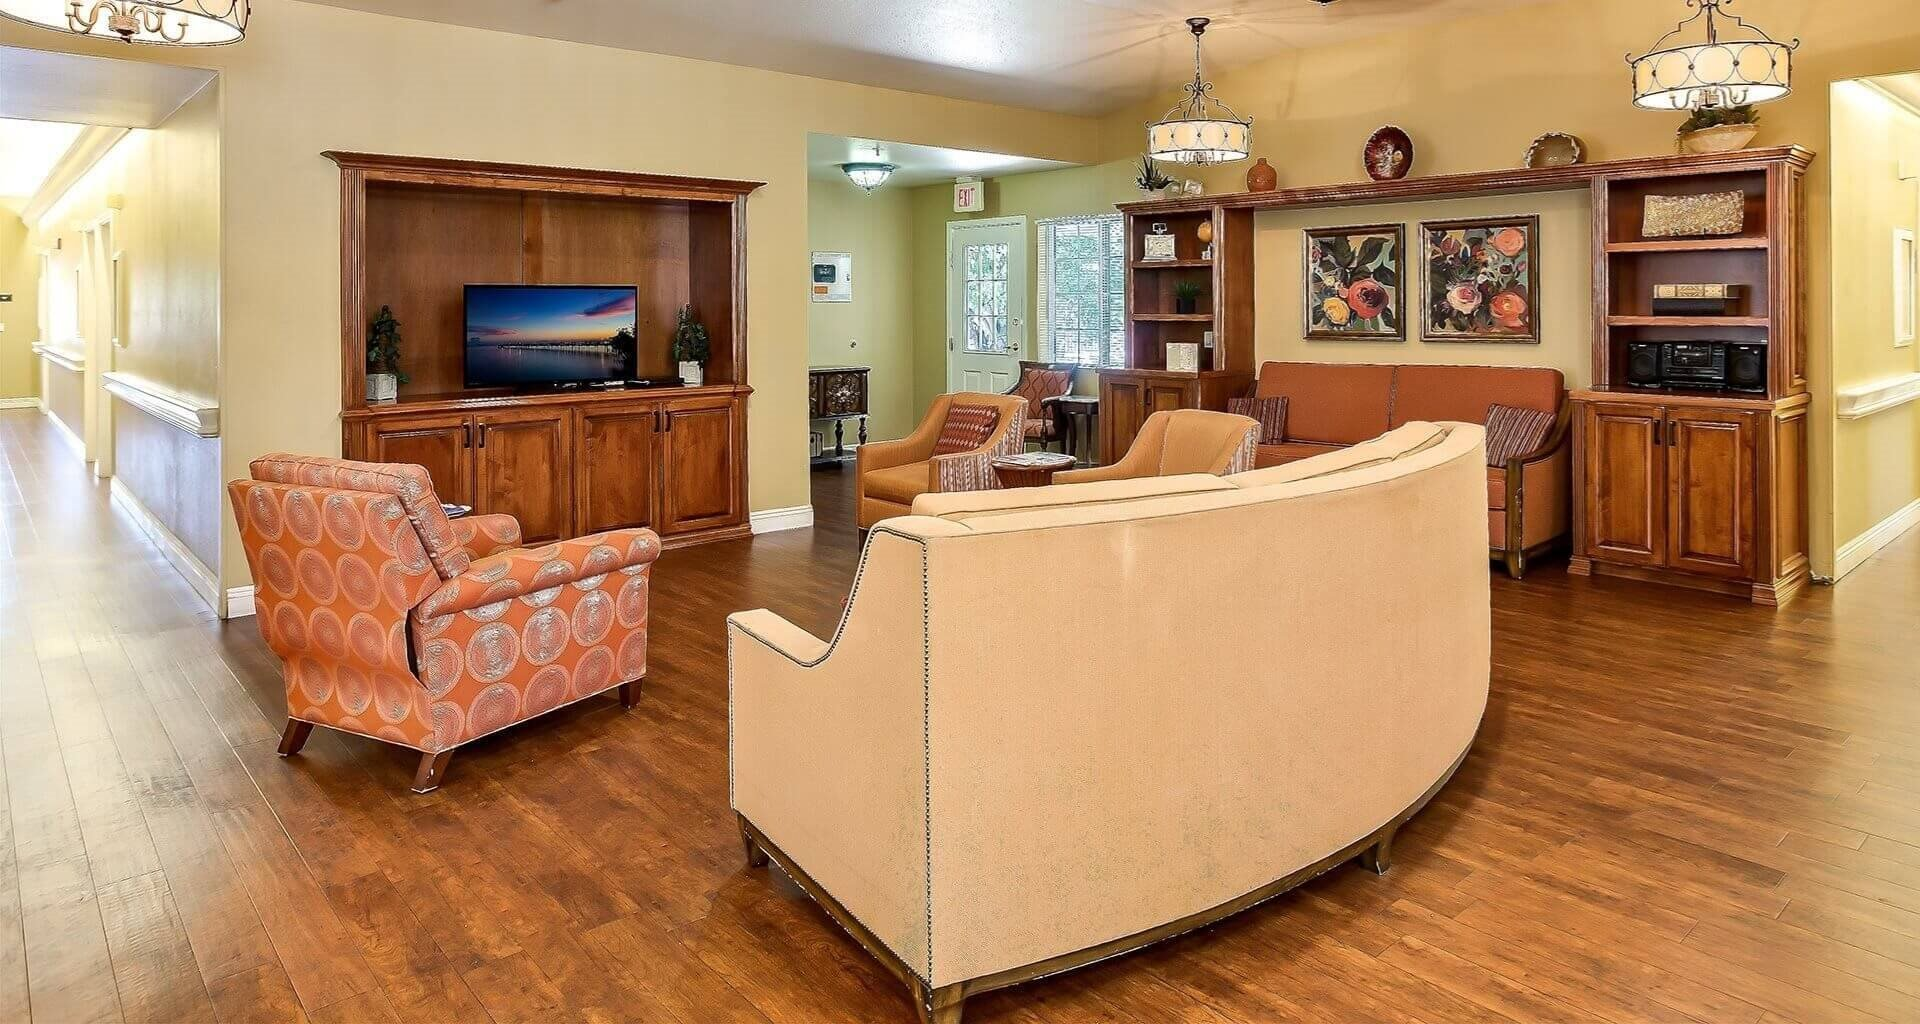 Modern Floor Plans Available at Pacifica Senior Living Tucson, Tucson, AZ